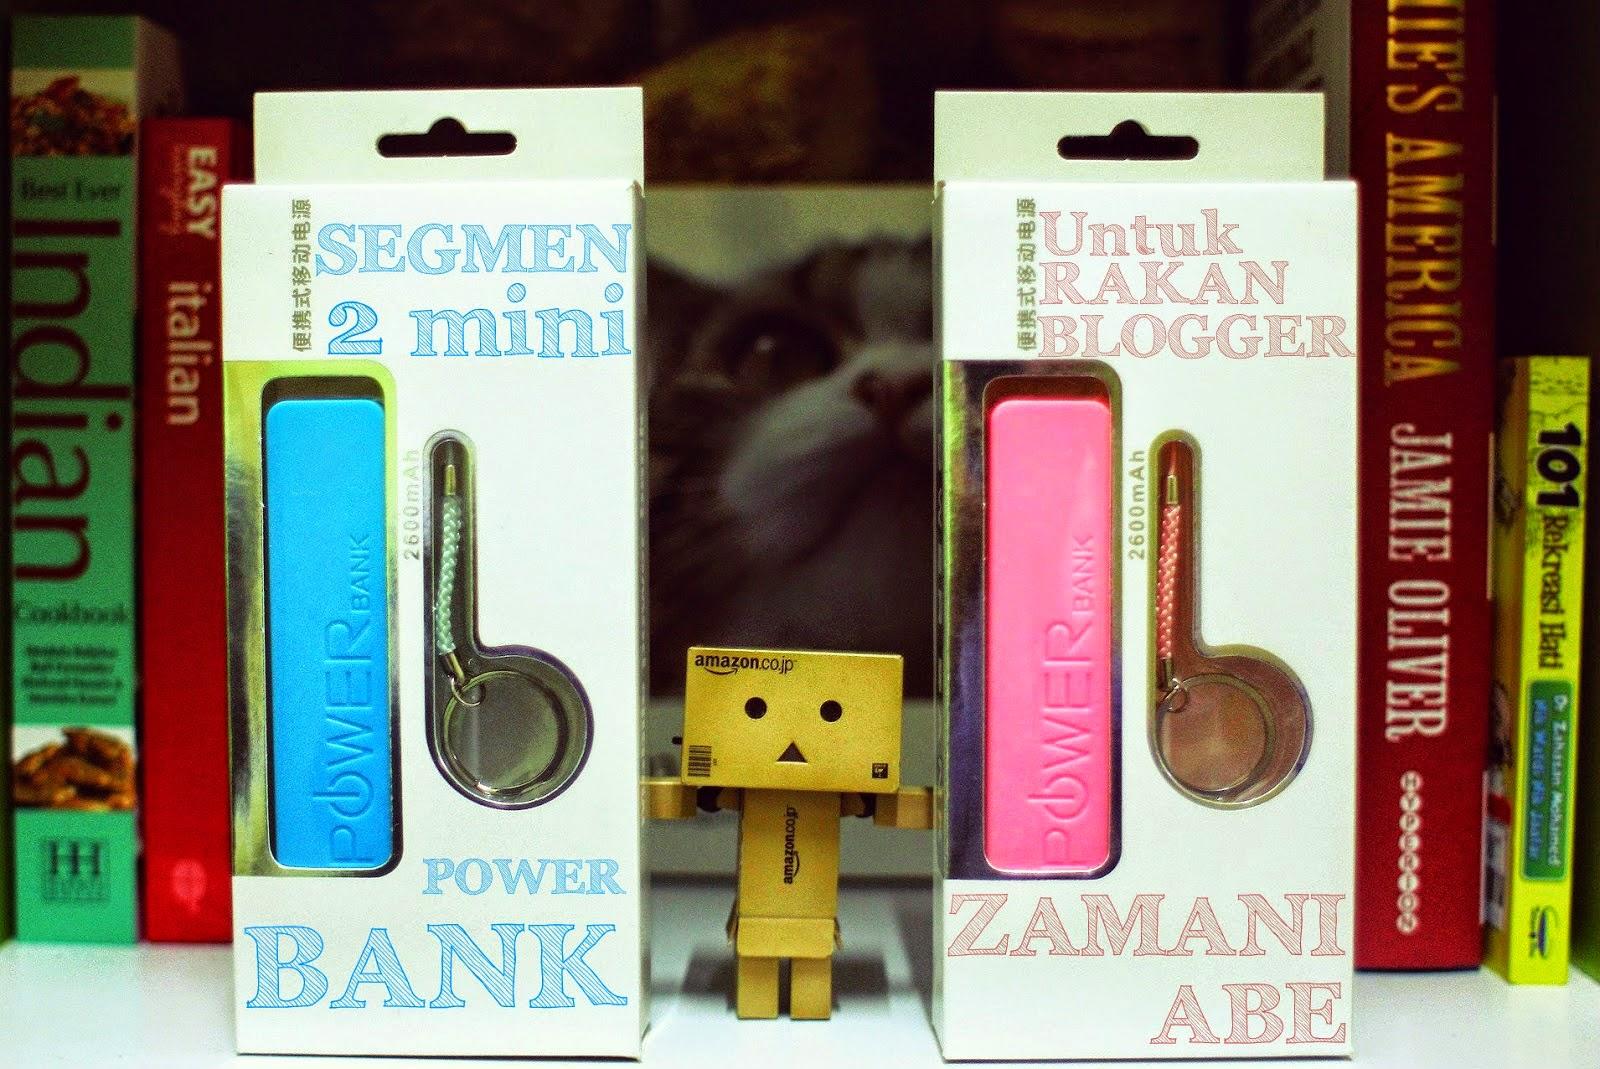 Segmen 2 Mini Power Bank Untuk Rakan Blogger Zamani Abe